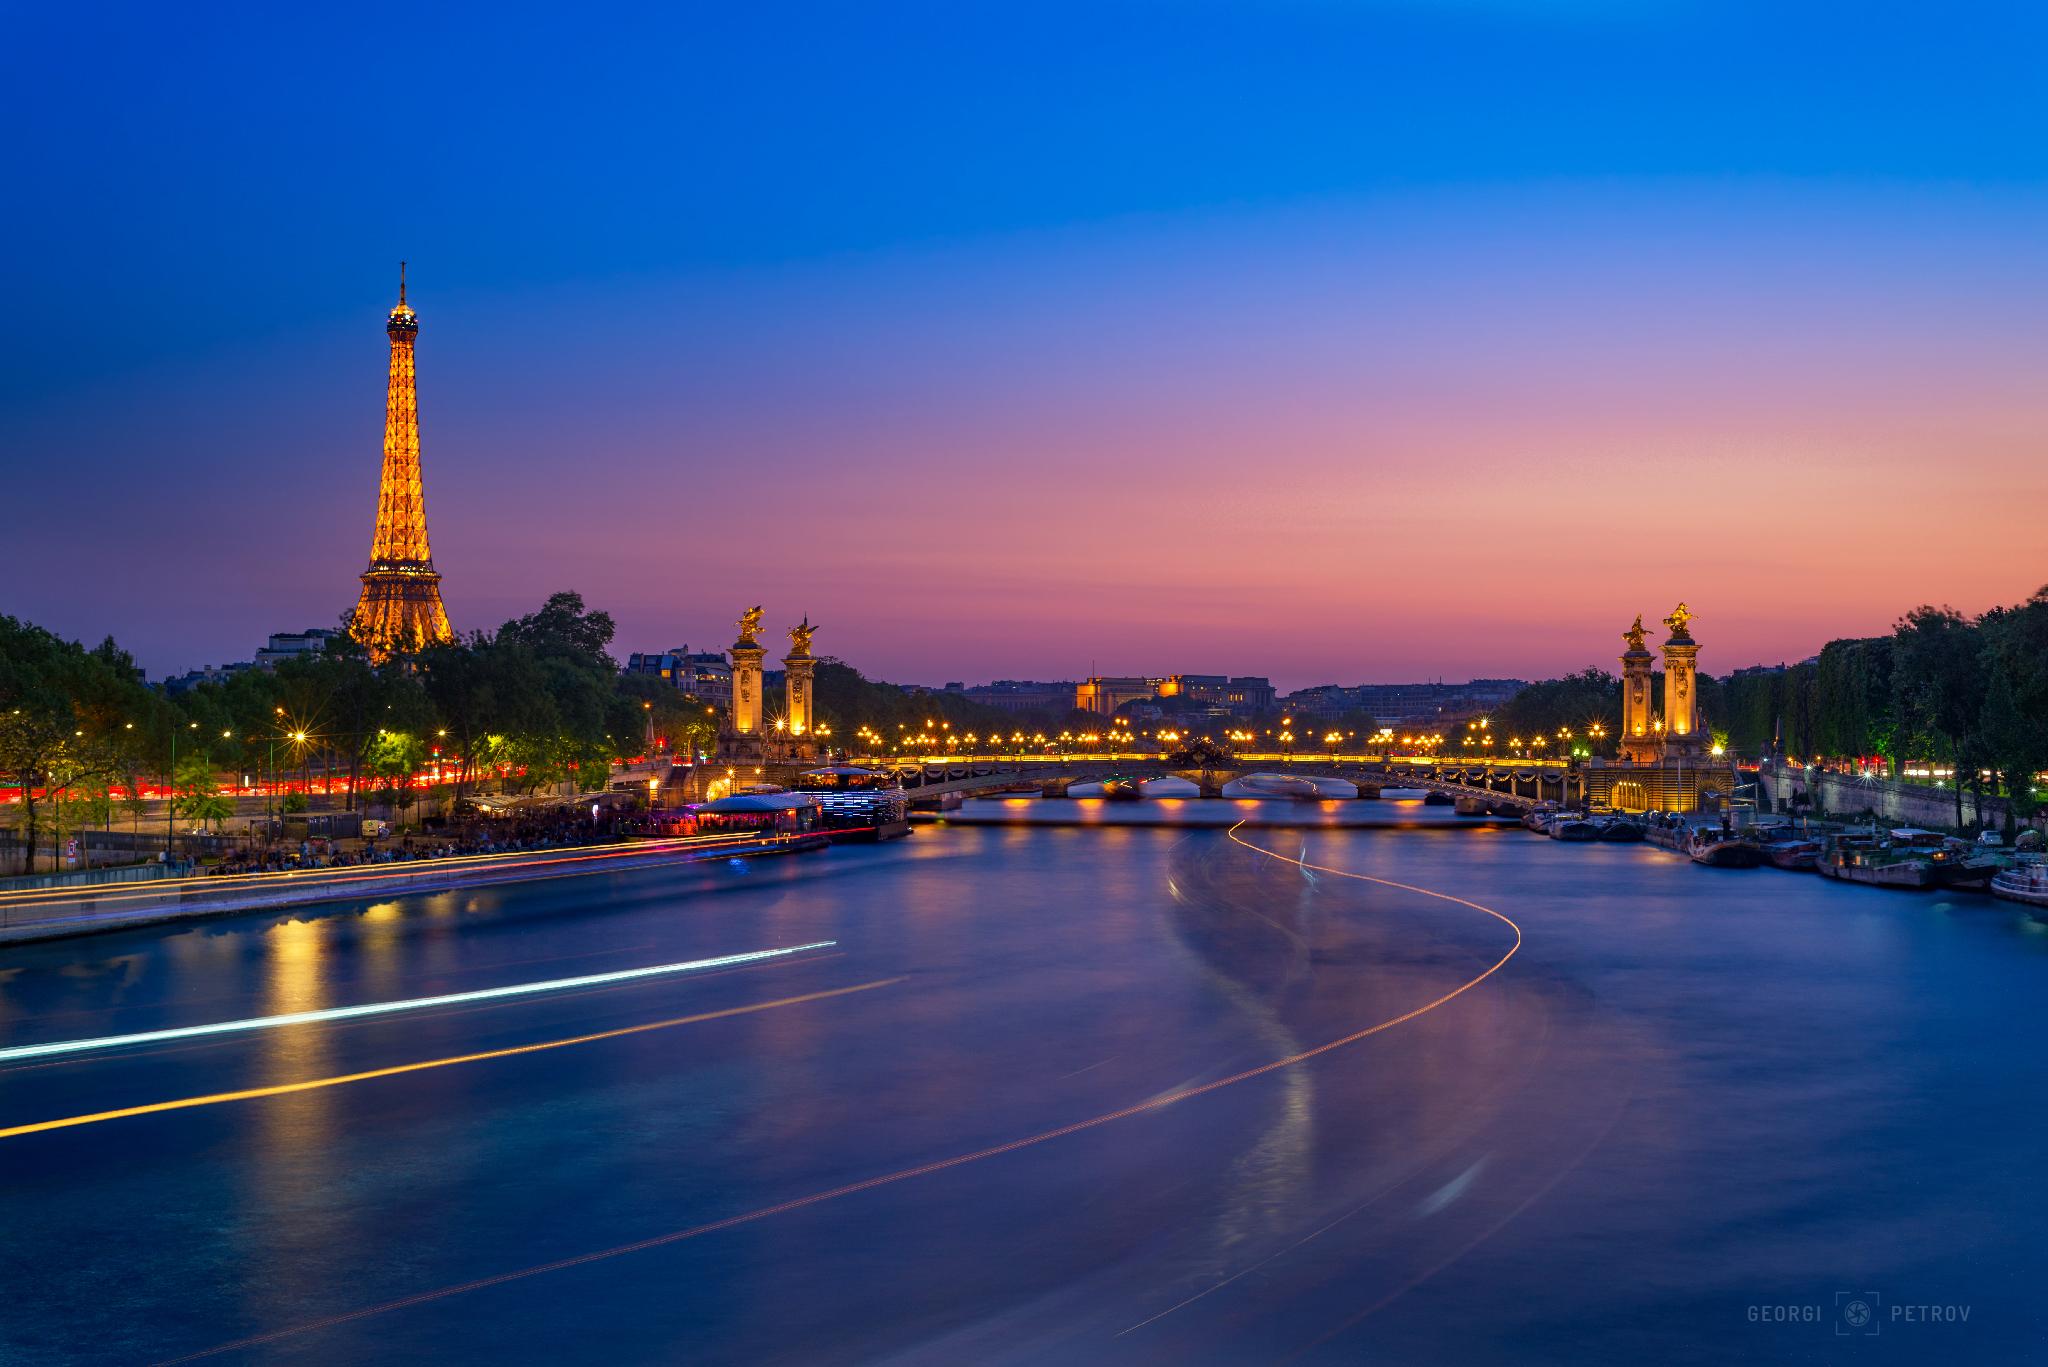 Eiffel Tower & Pont Alexandre III from Pont de la Concorde, France